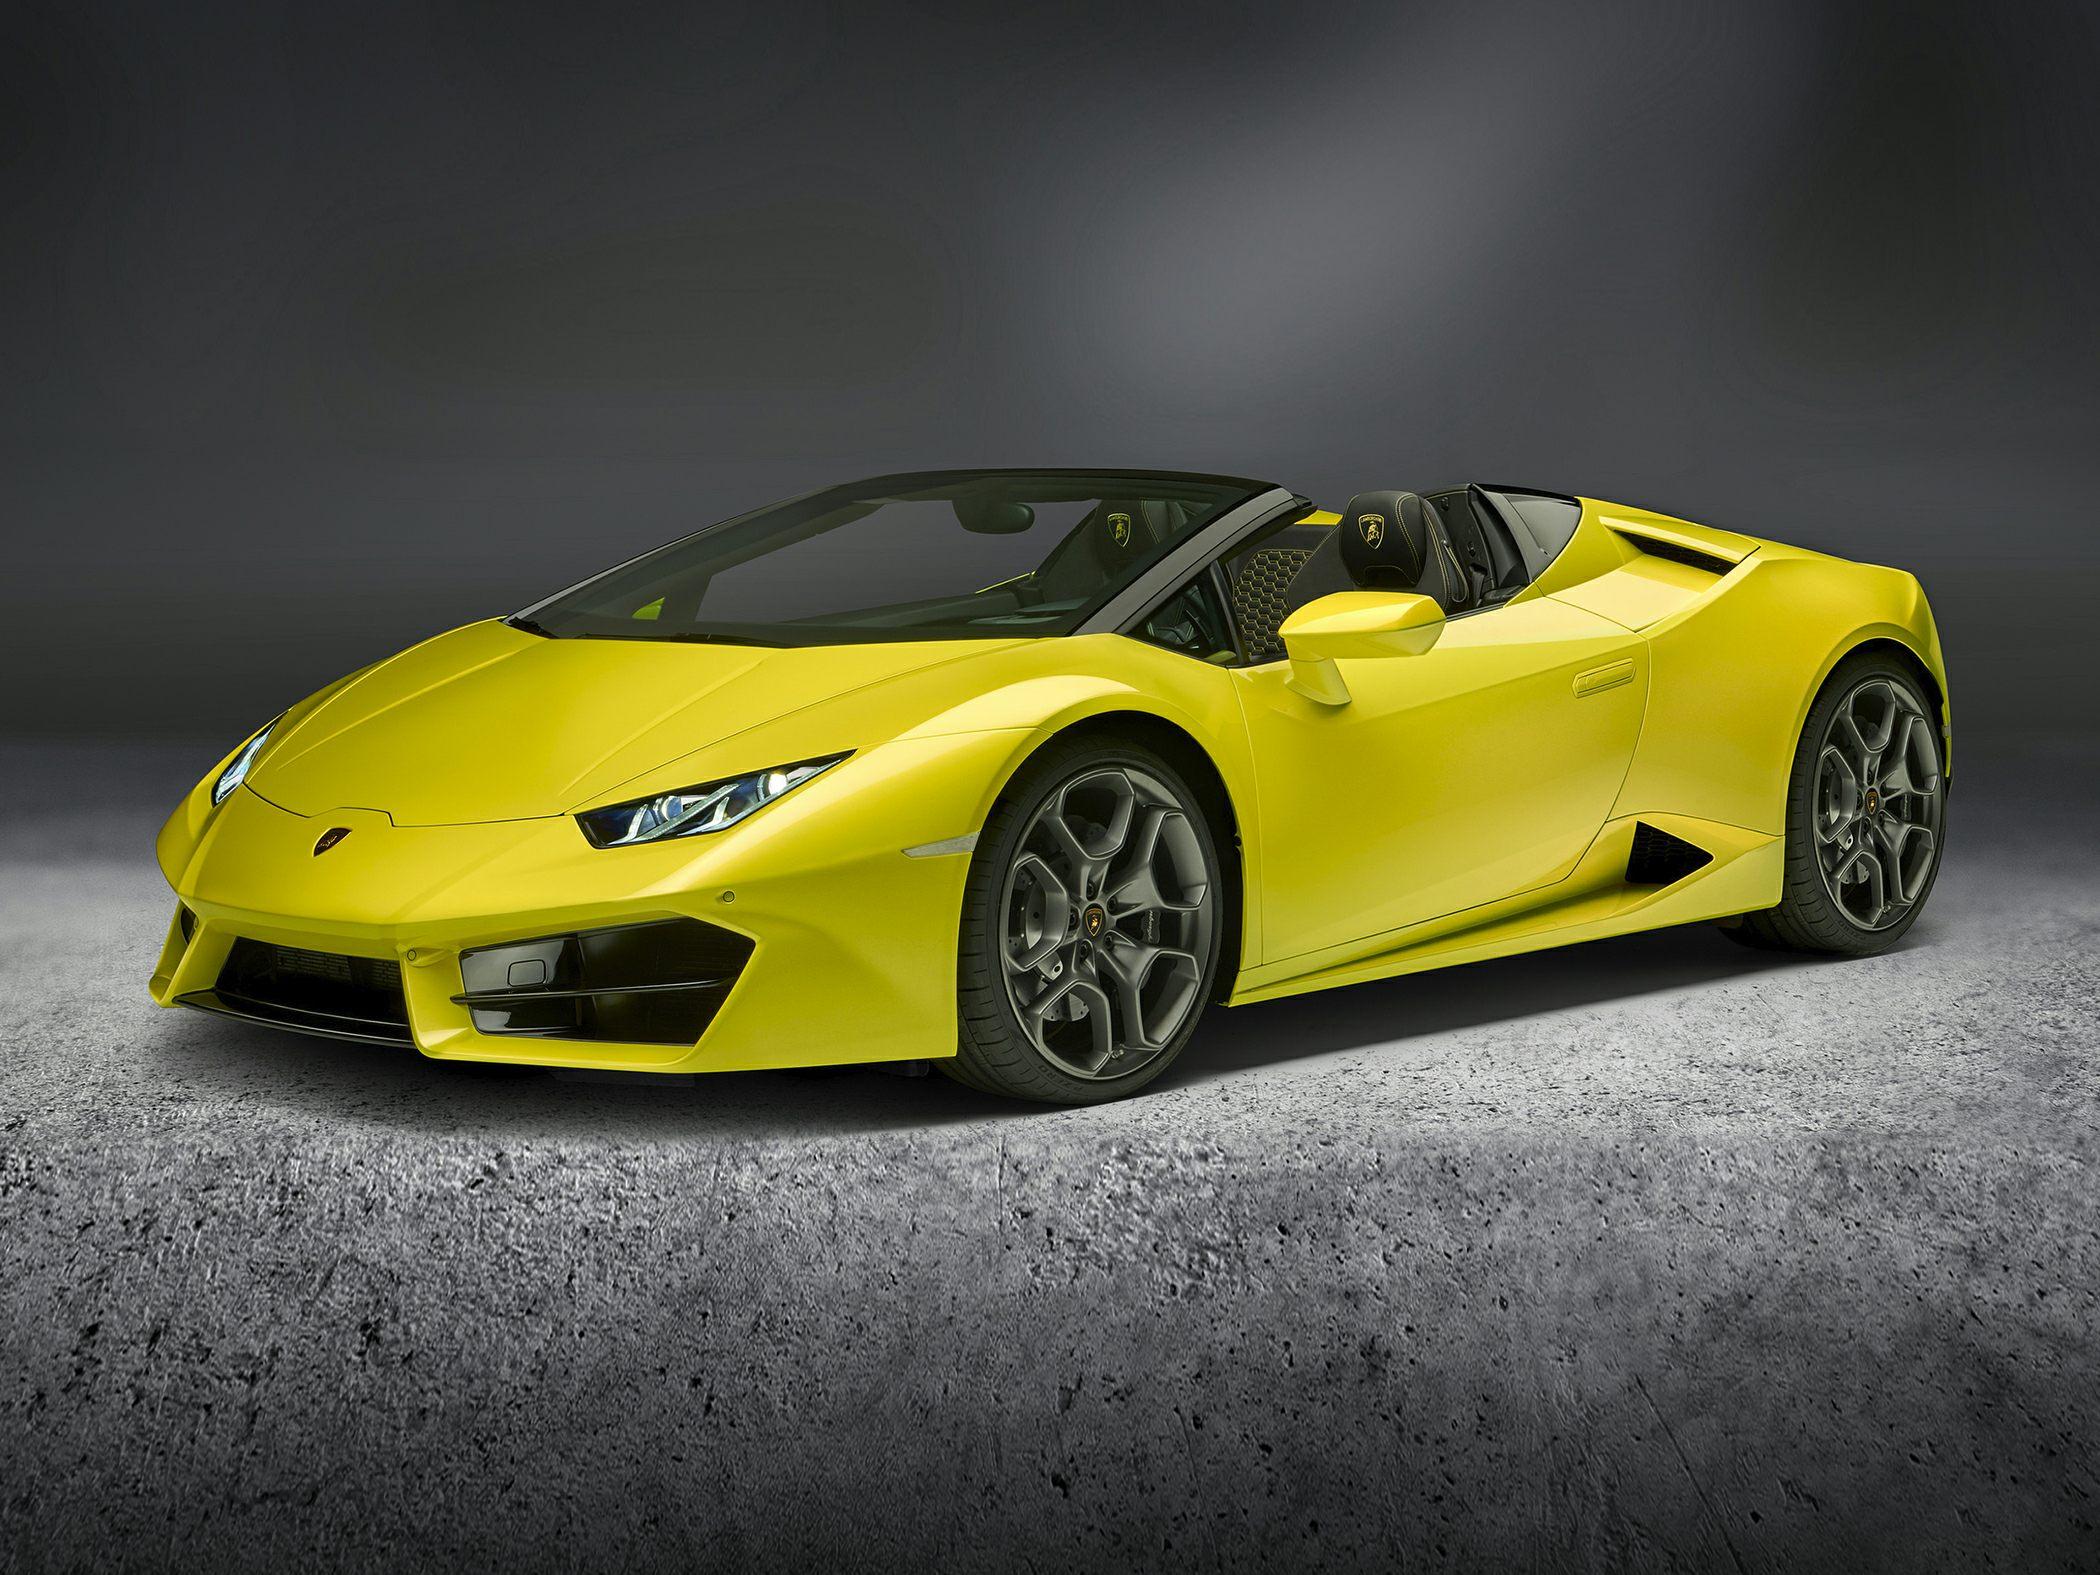 2019 Lamborghini Huracan Lp580 2s 2dr Rear Wheel Drive Spyder